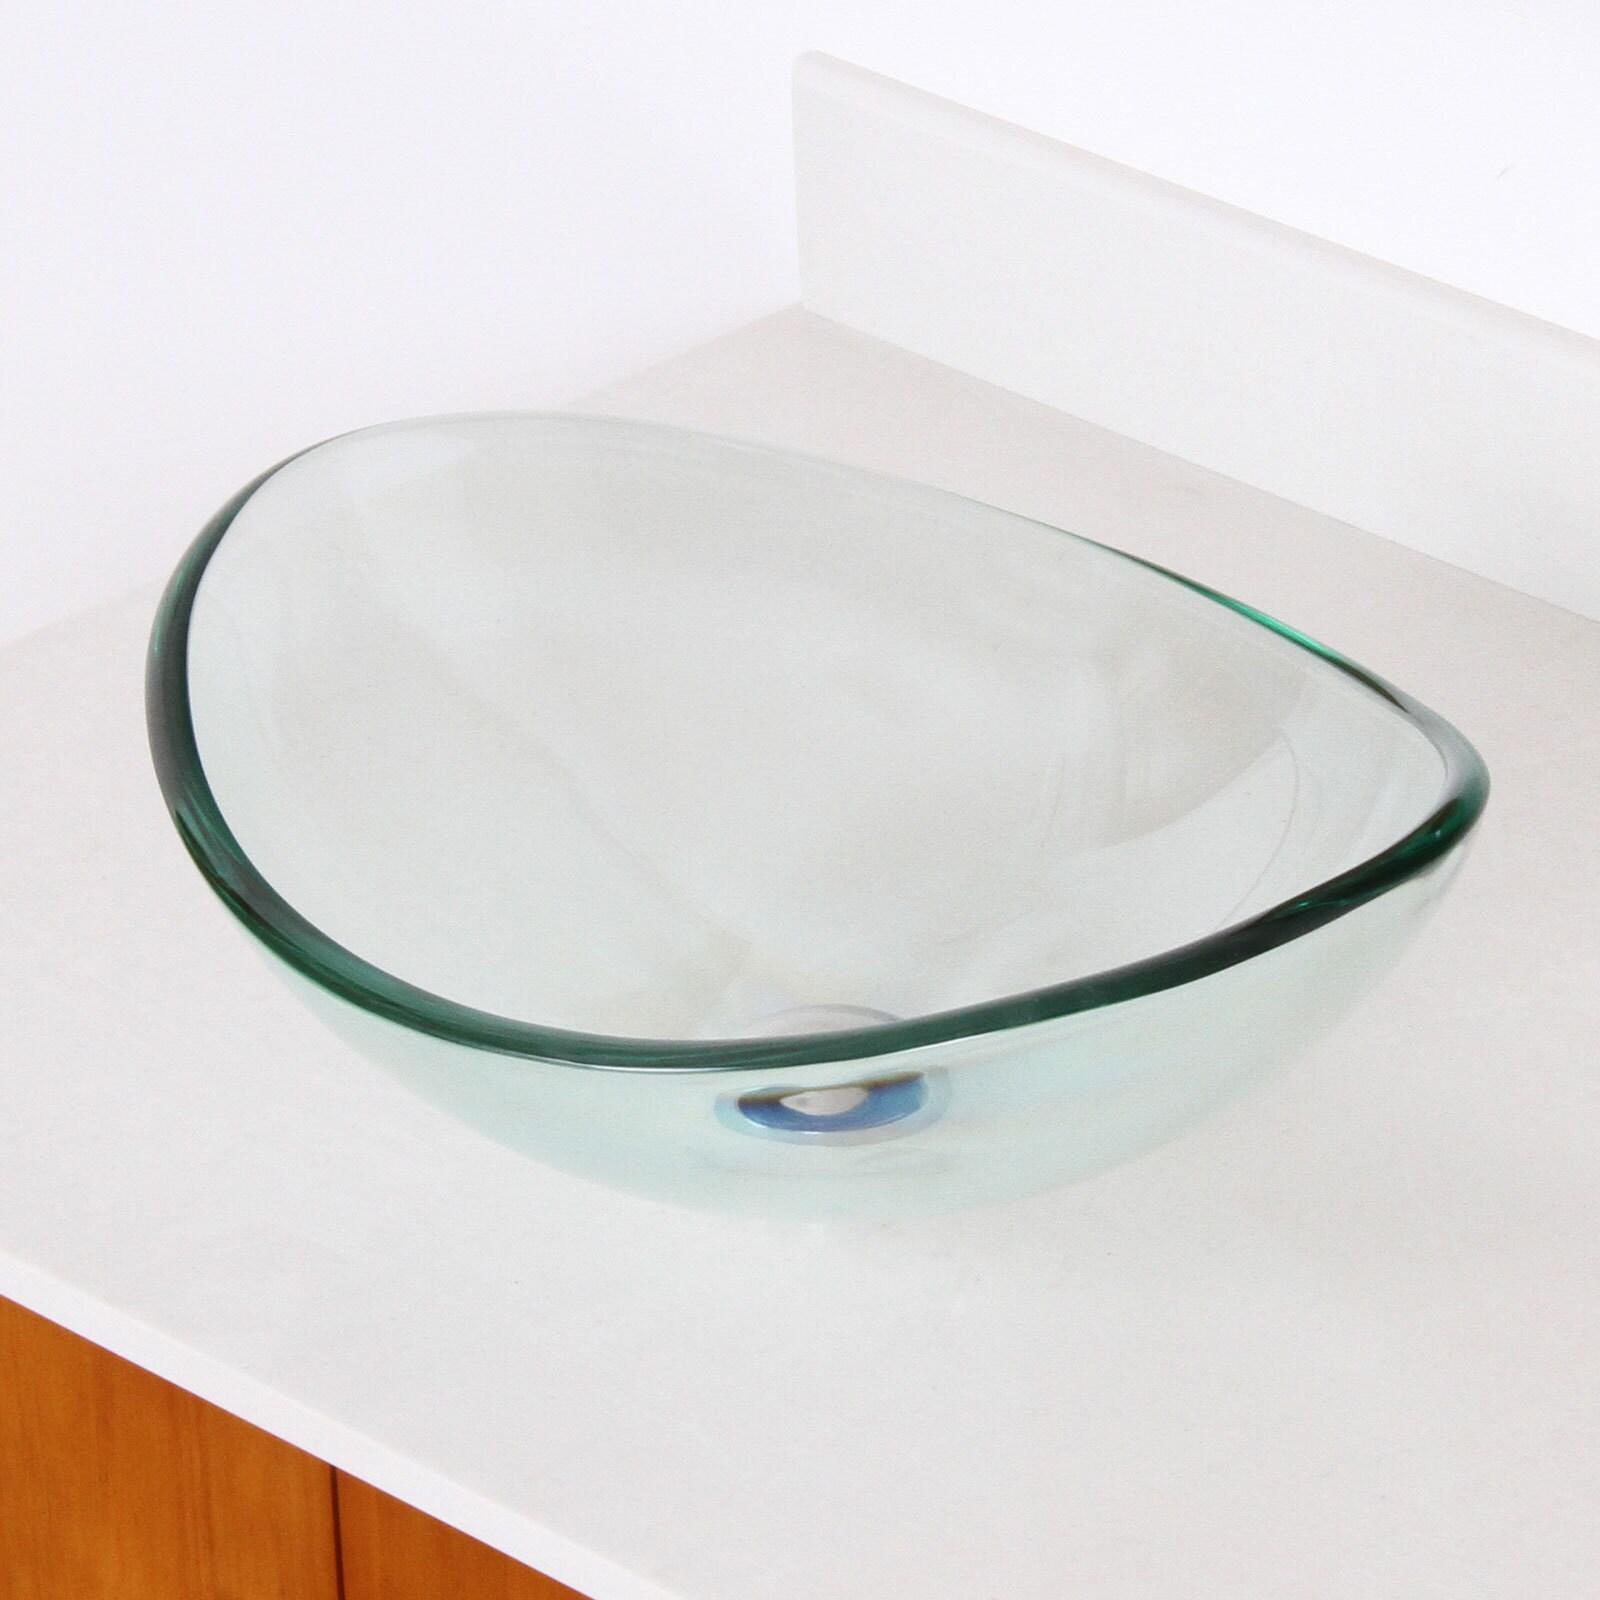 Elite 1418+F22T Unique Oval Transparent Tempered Glass Bathroom ...